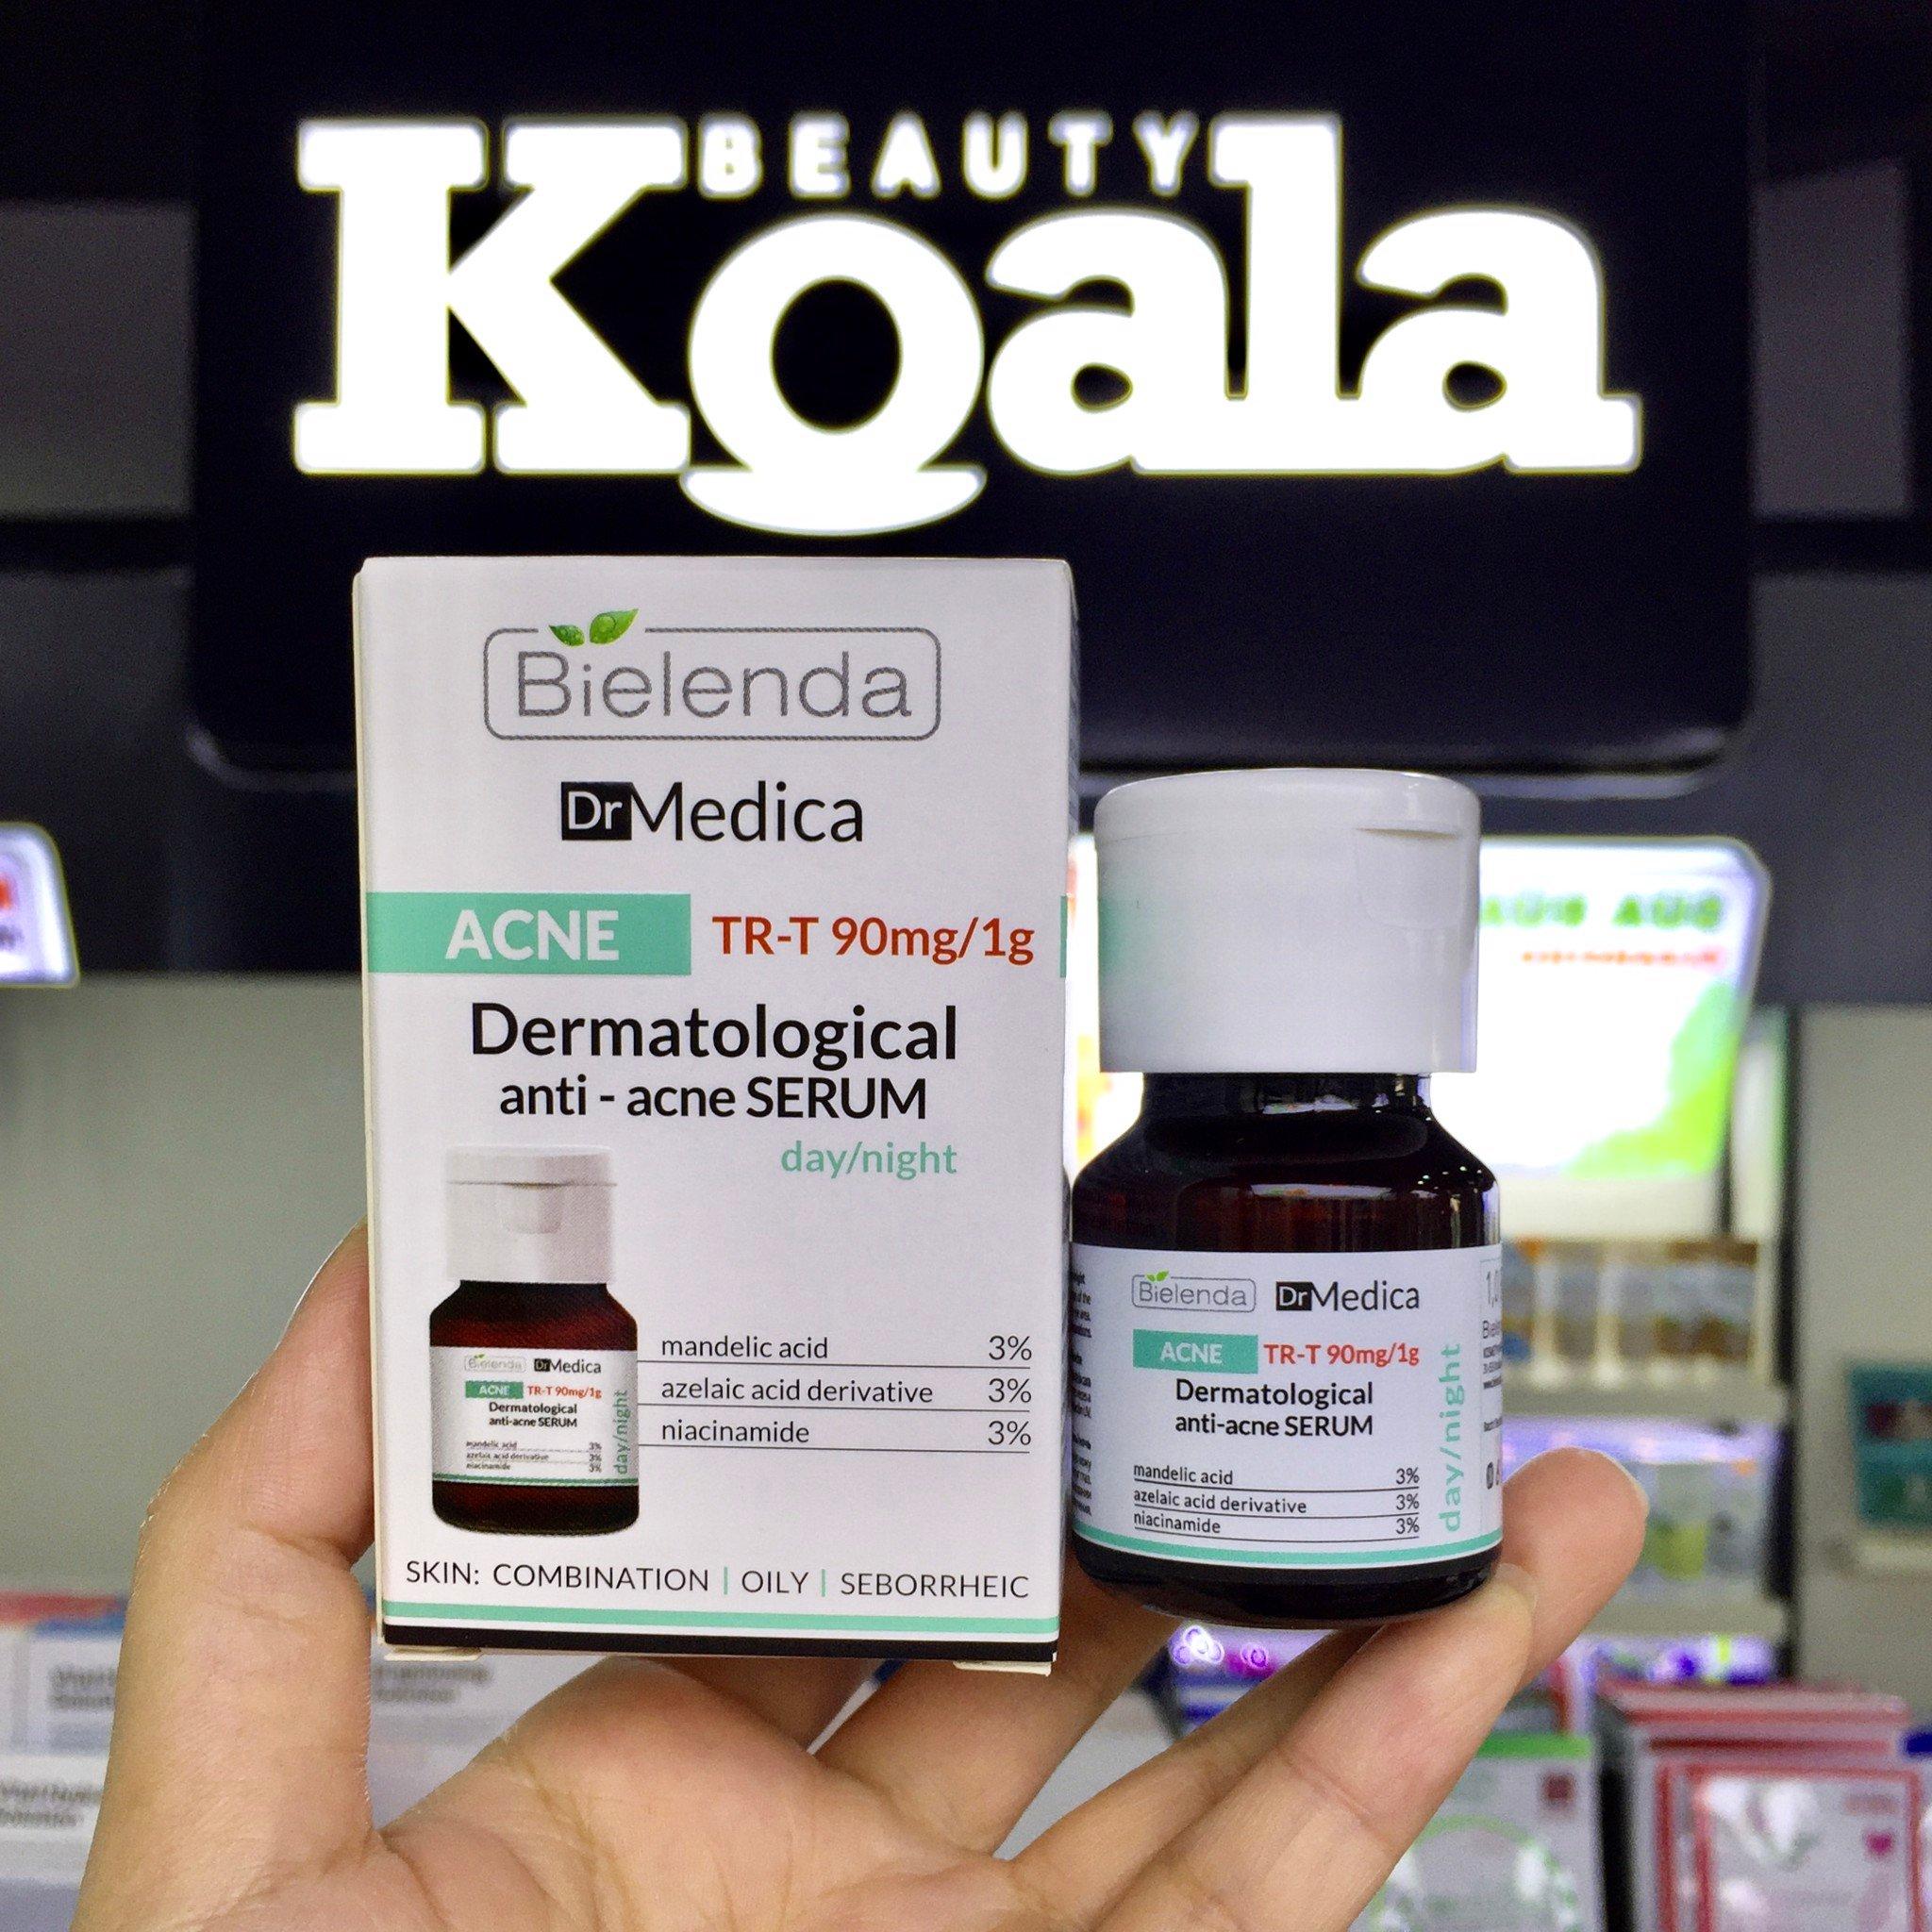 Tinh Chất Đặc Trị Mụn Giảm Thâm Dr Medica ACNE Dermatological Anti-Acne Serum 30ml